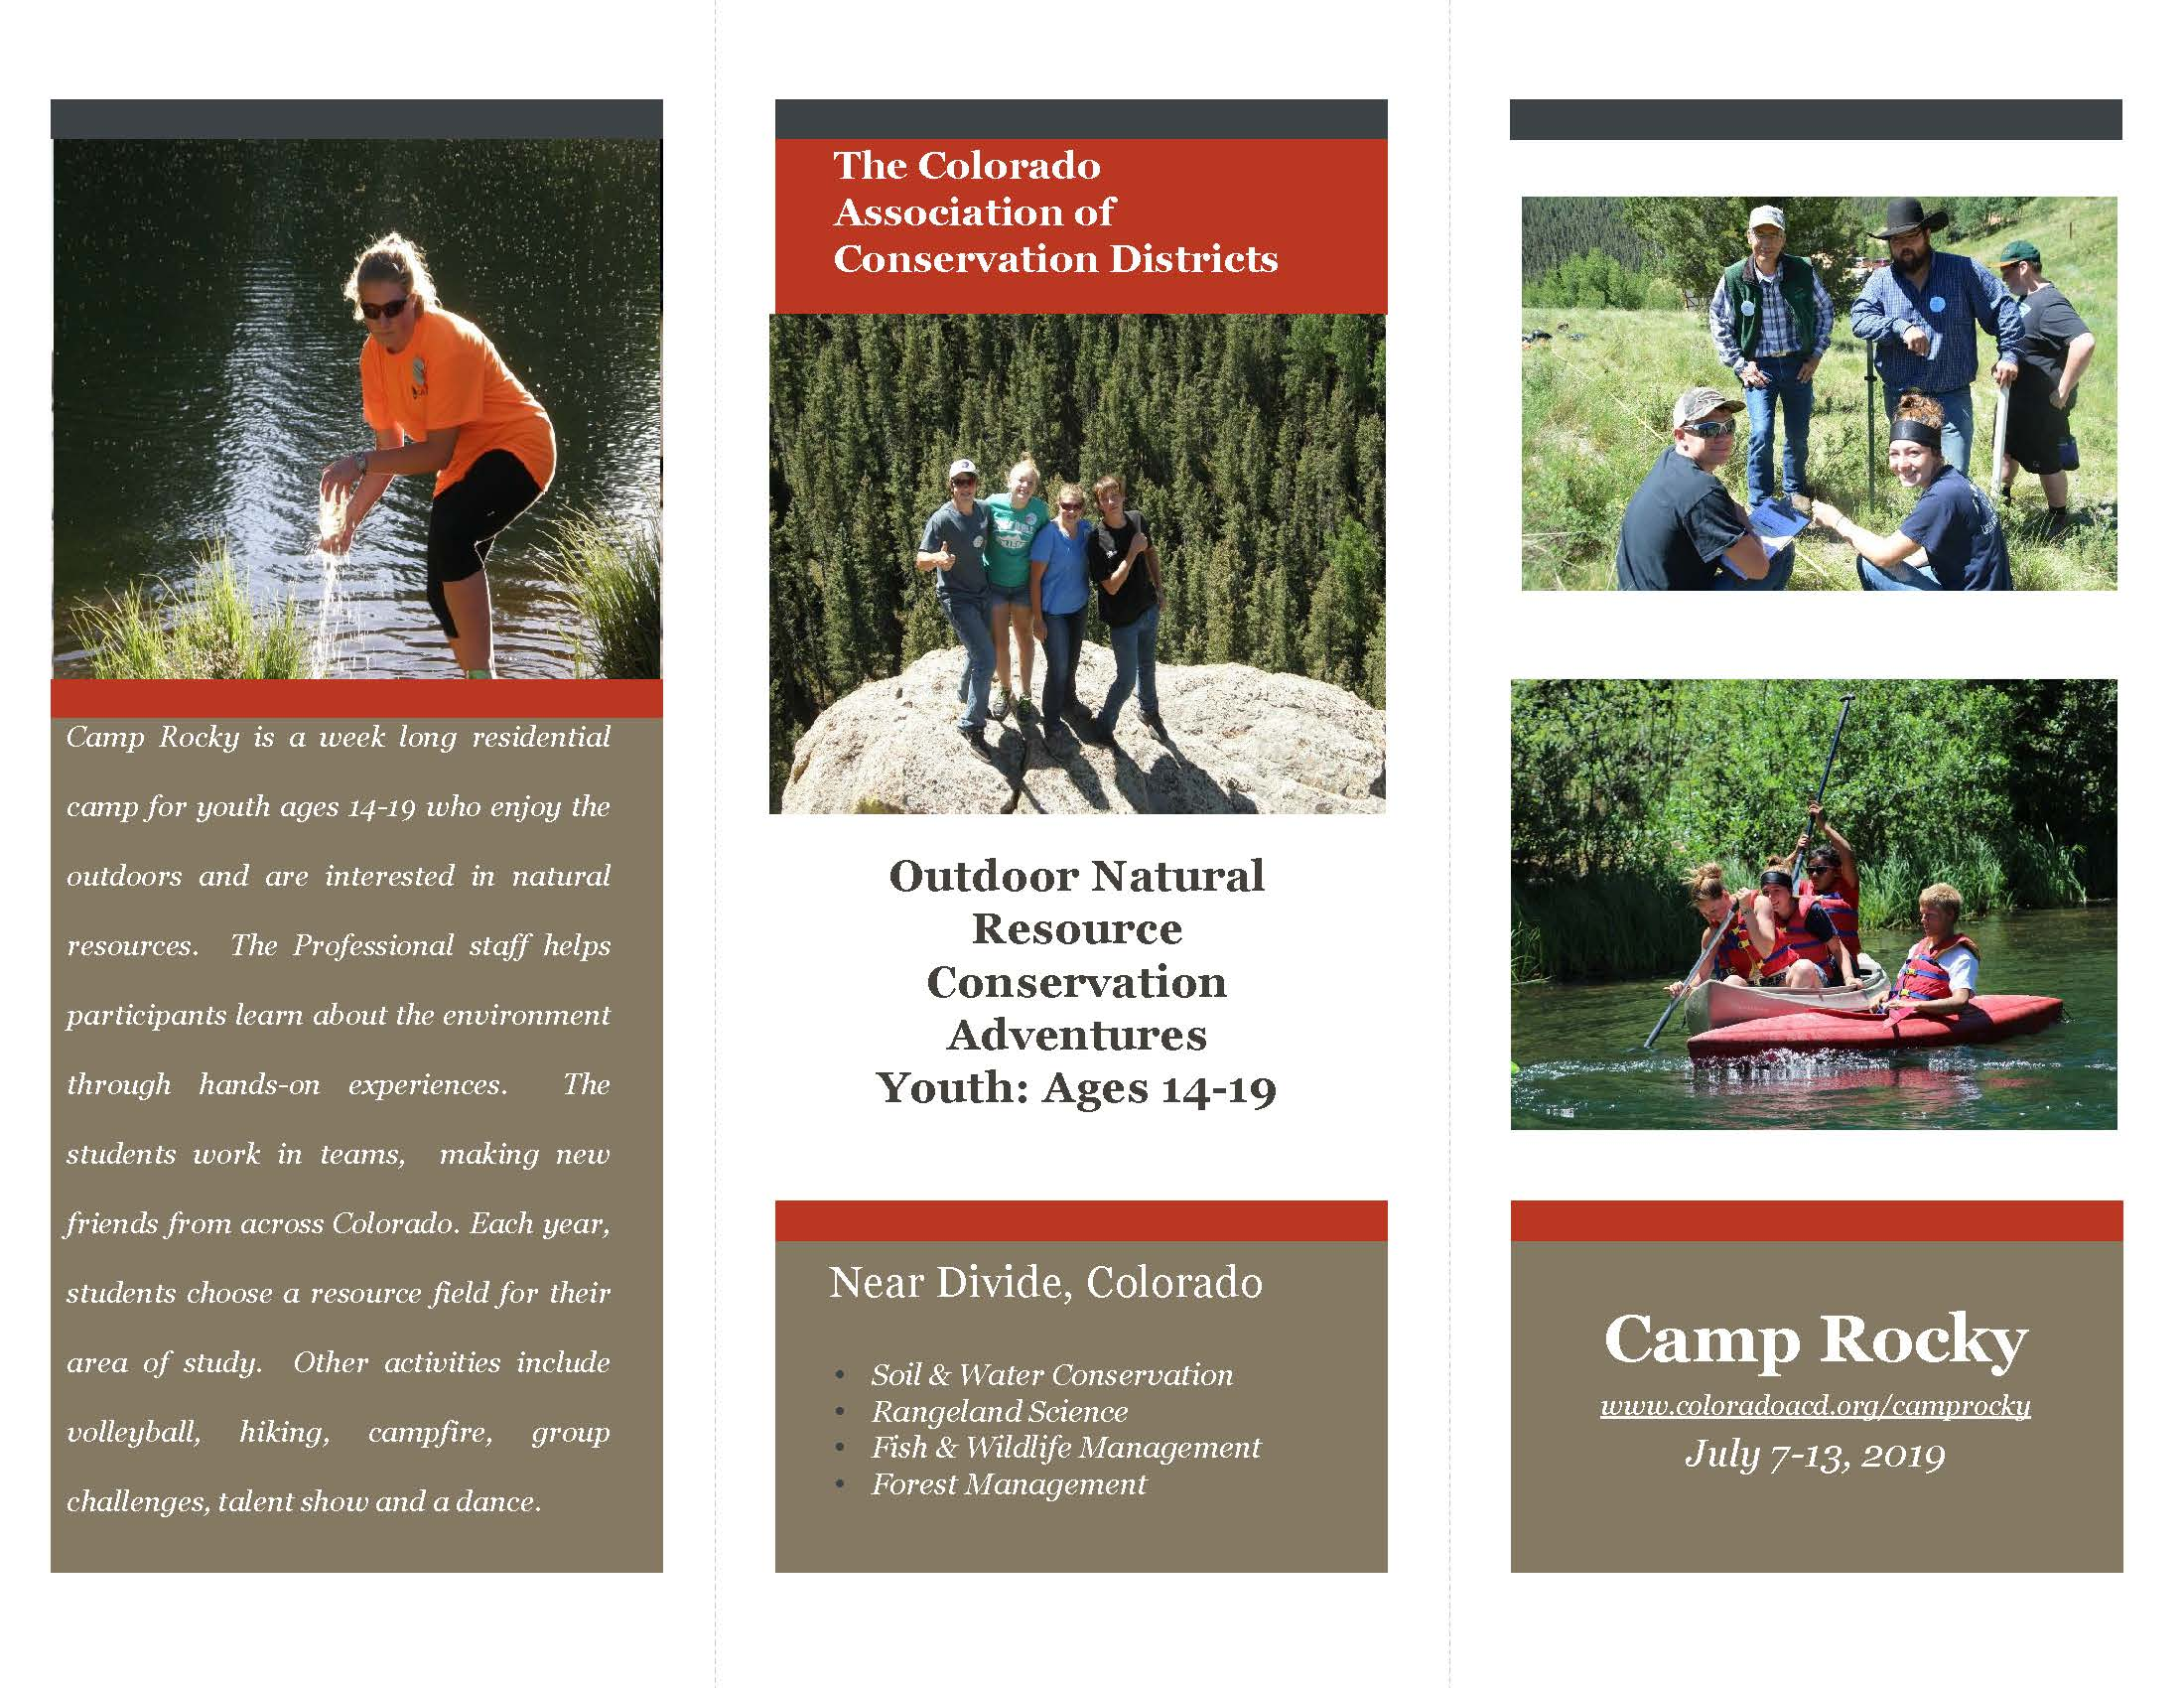 2019 Camp Rocky Brochure_Page_1.jpg